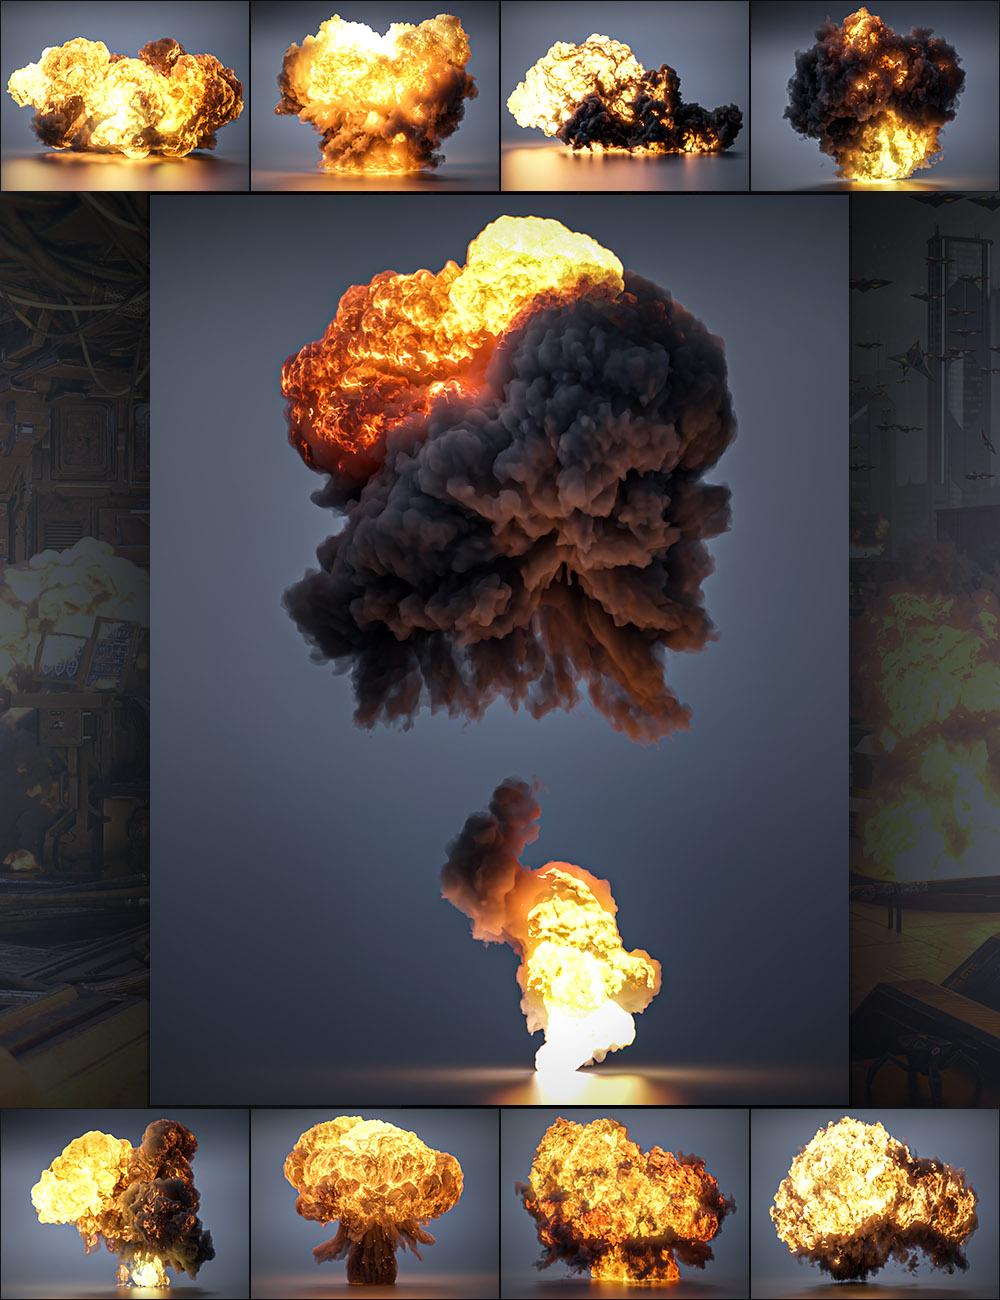 Pyromantix - Volumetric Explosions by: DimensionTheory, 3D Models by Daz 3D